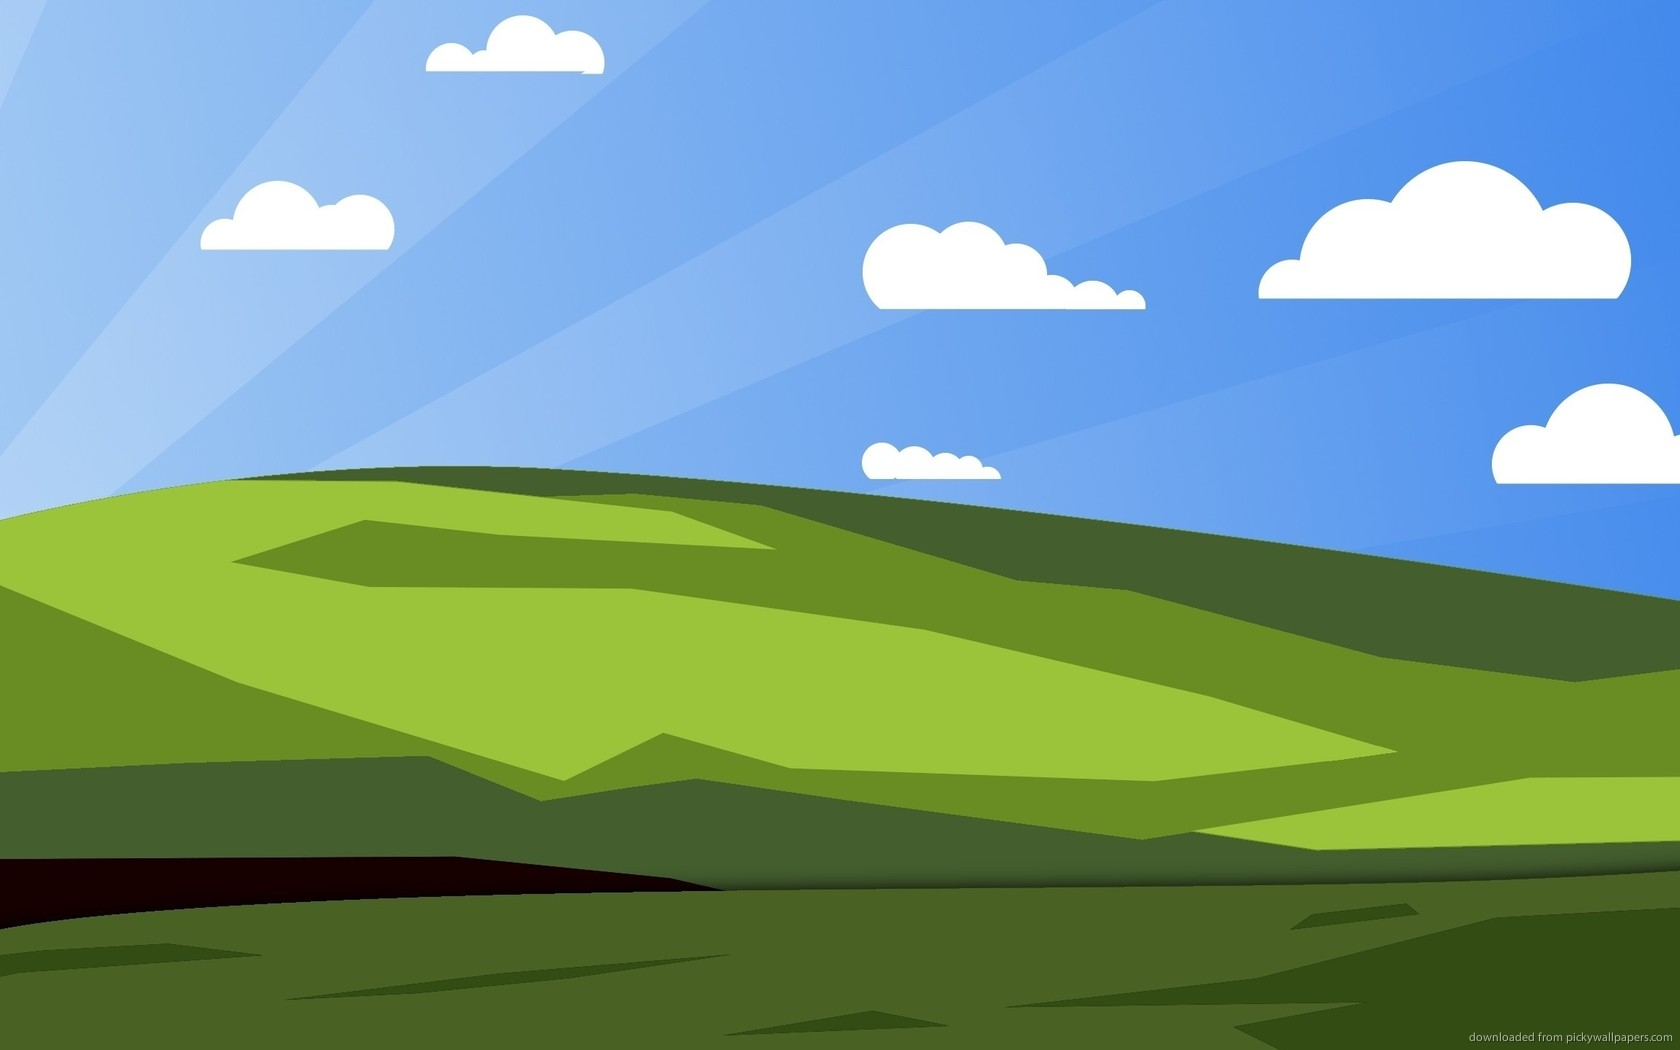 Download 1680x1050 Simplified Classic Windows Desktop Wallpaper 1680x1050